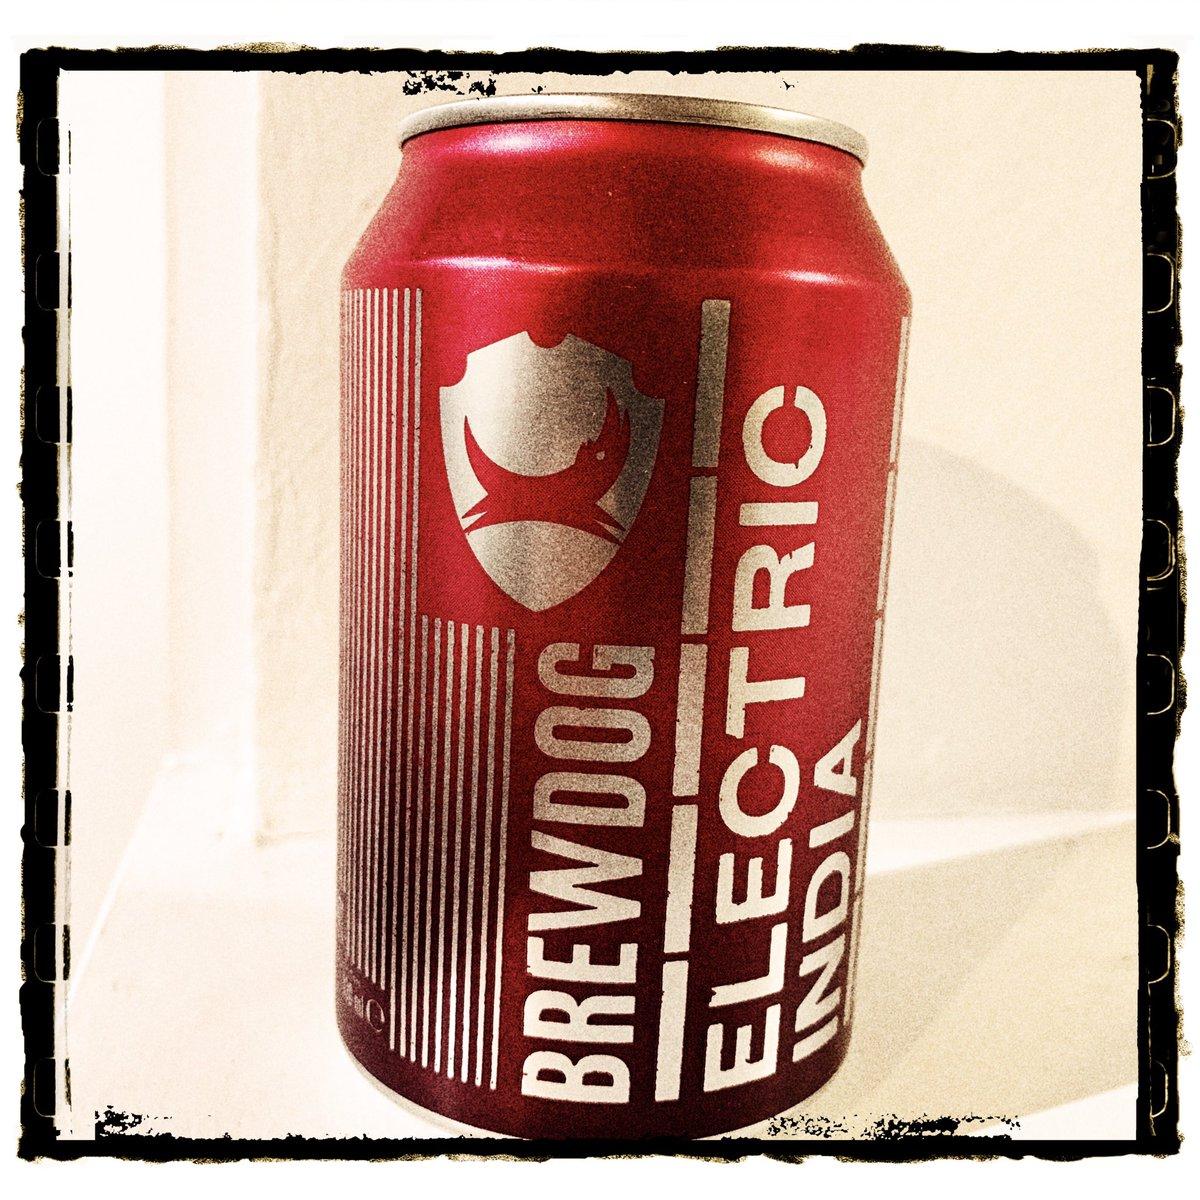 Season of Beer day 15: Brewdog Electric India, a farmhouse ale-style brew #xmascheers @TheBeerHawk